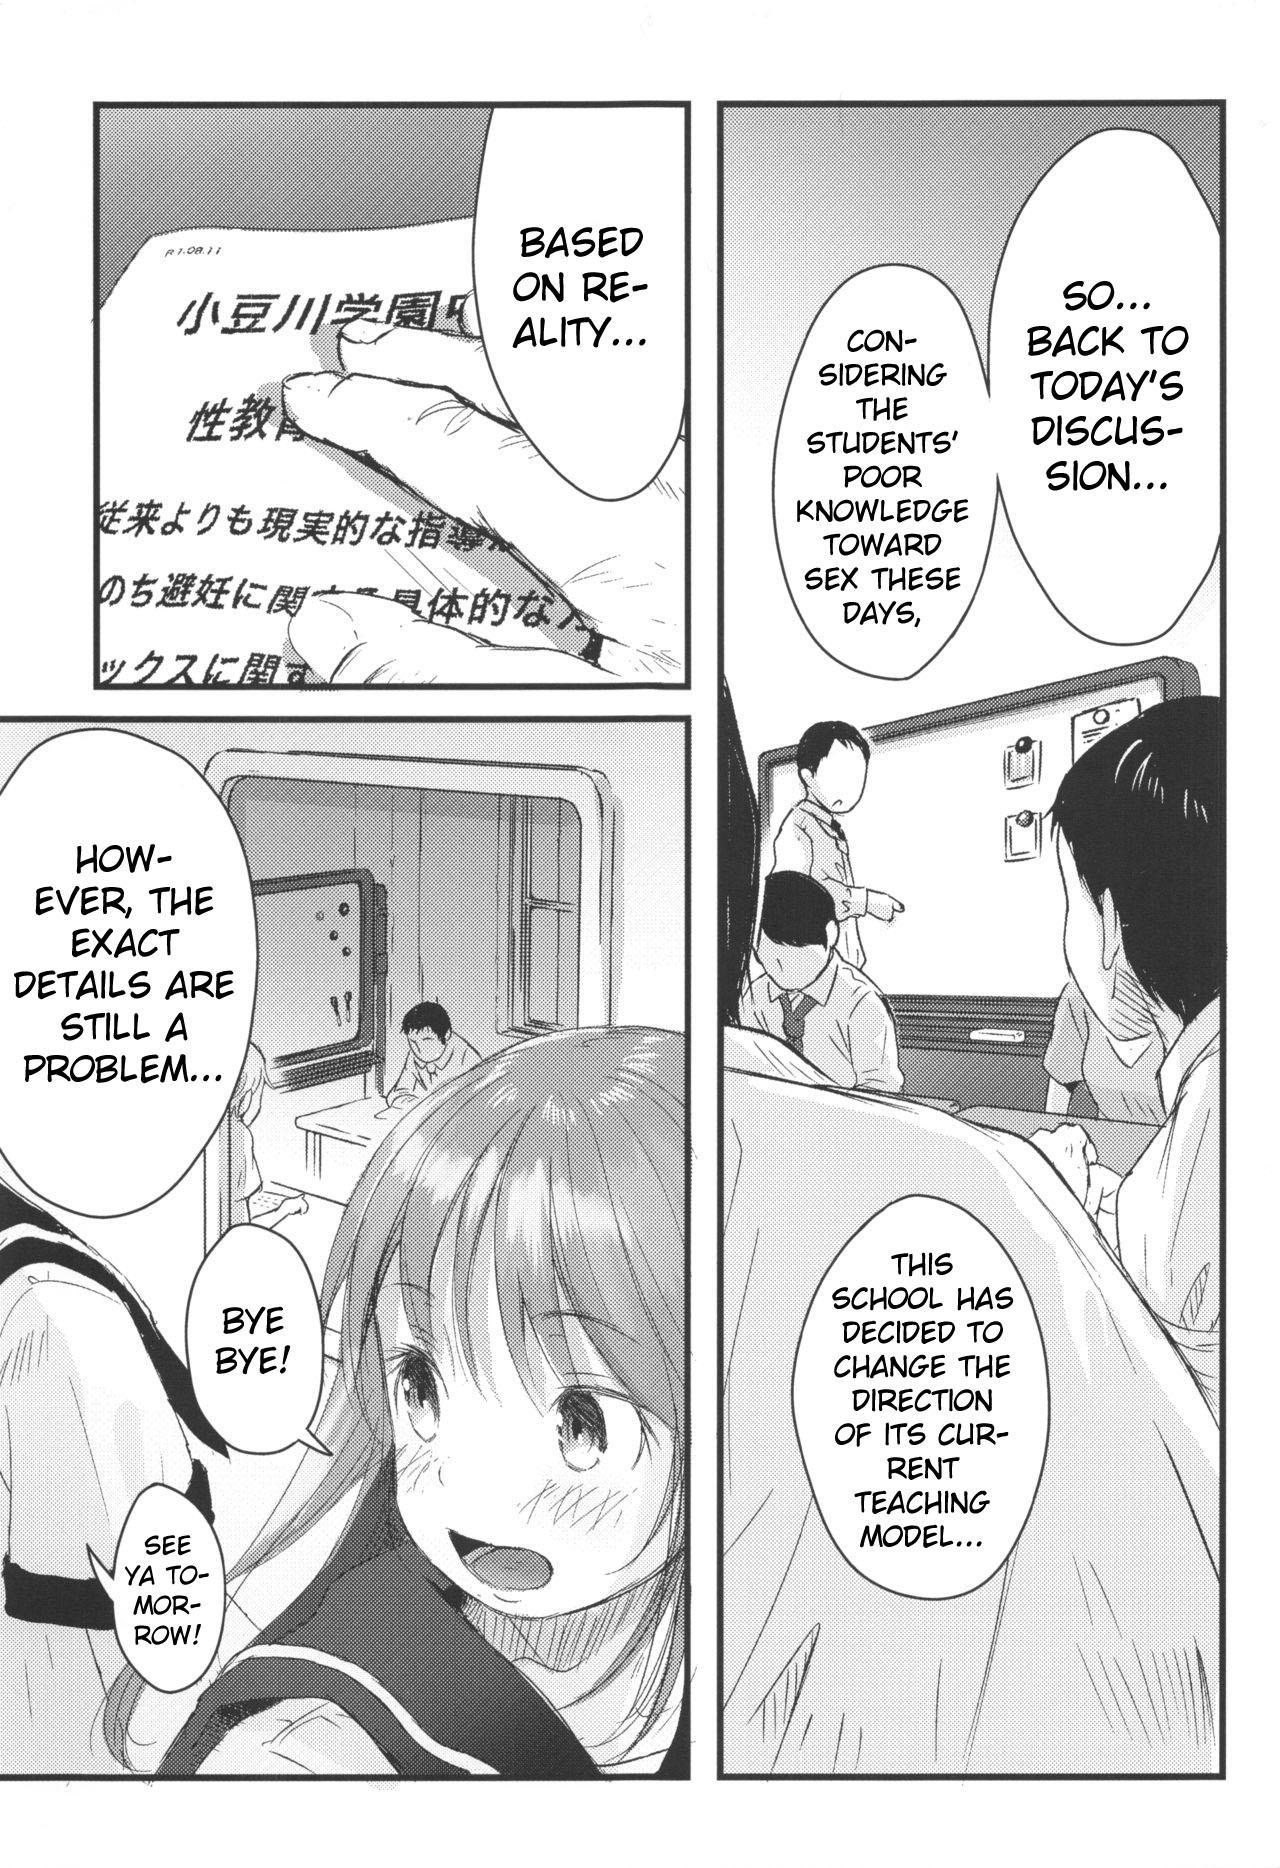 [Peromex (Tamanoi Peromekuri)] ©-sei de Manabu, Tadashii Sex Kouza   JC Hands-On Proper Sex Lecture [English] [bientaimon] [2019-11-09] 3